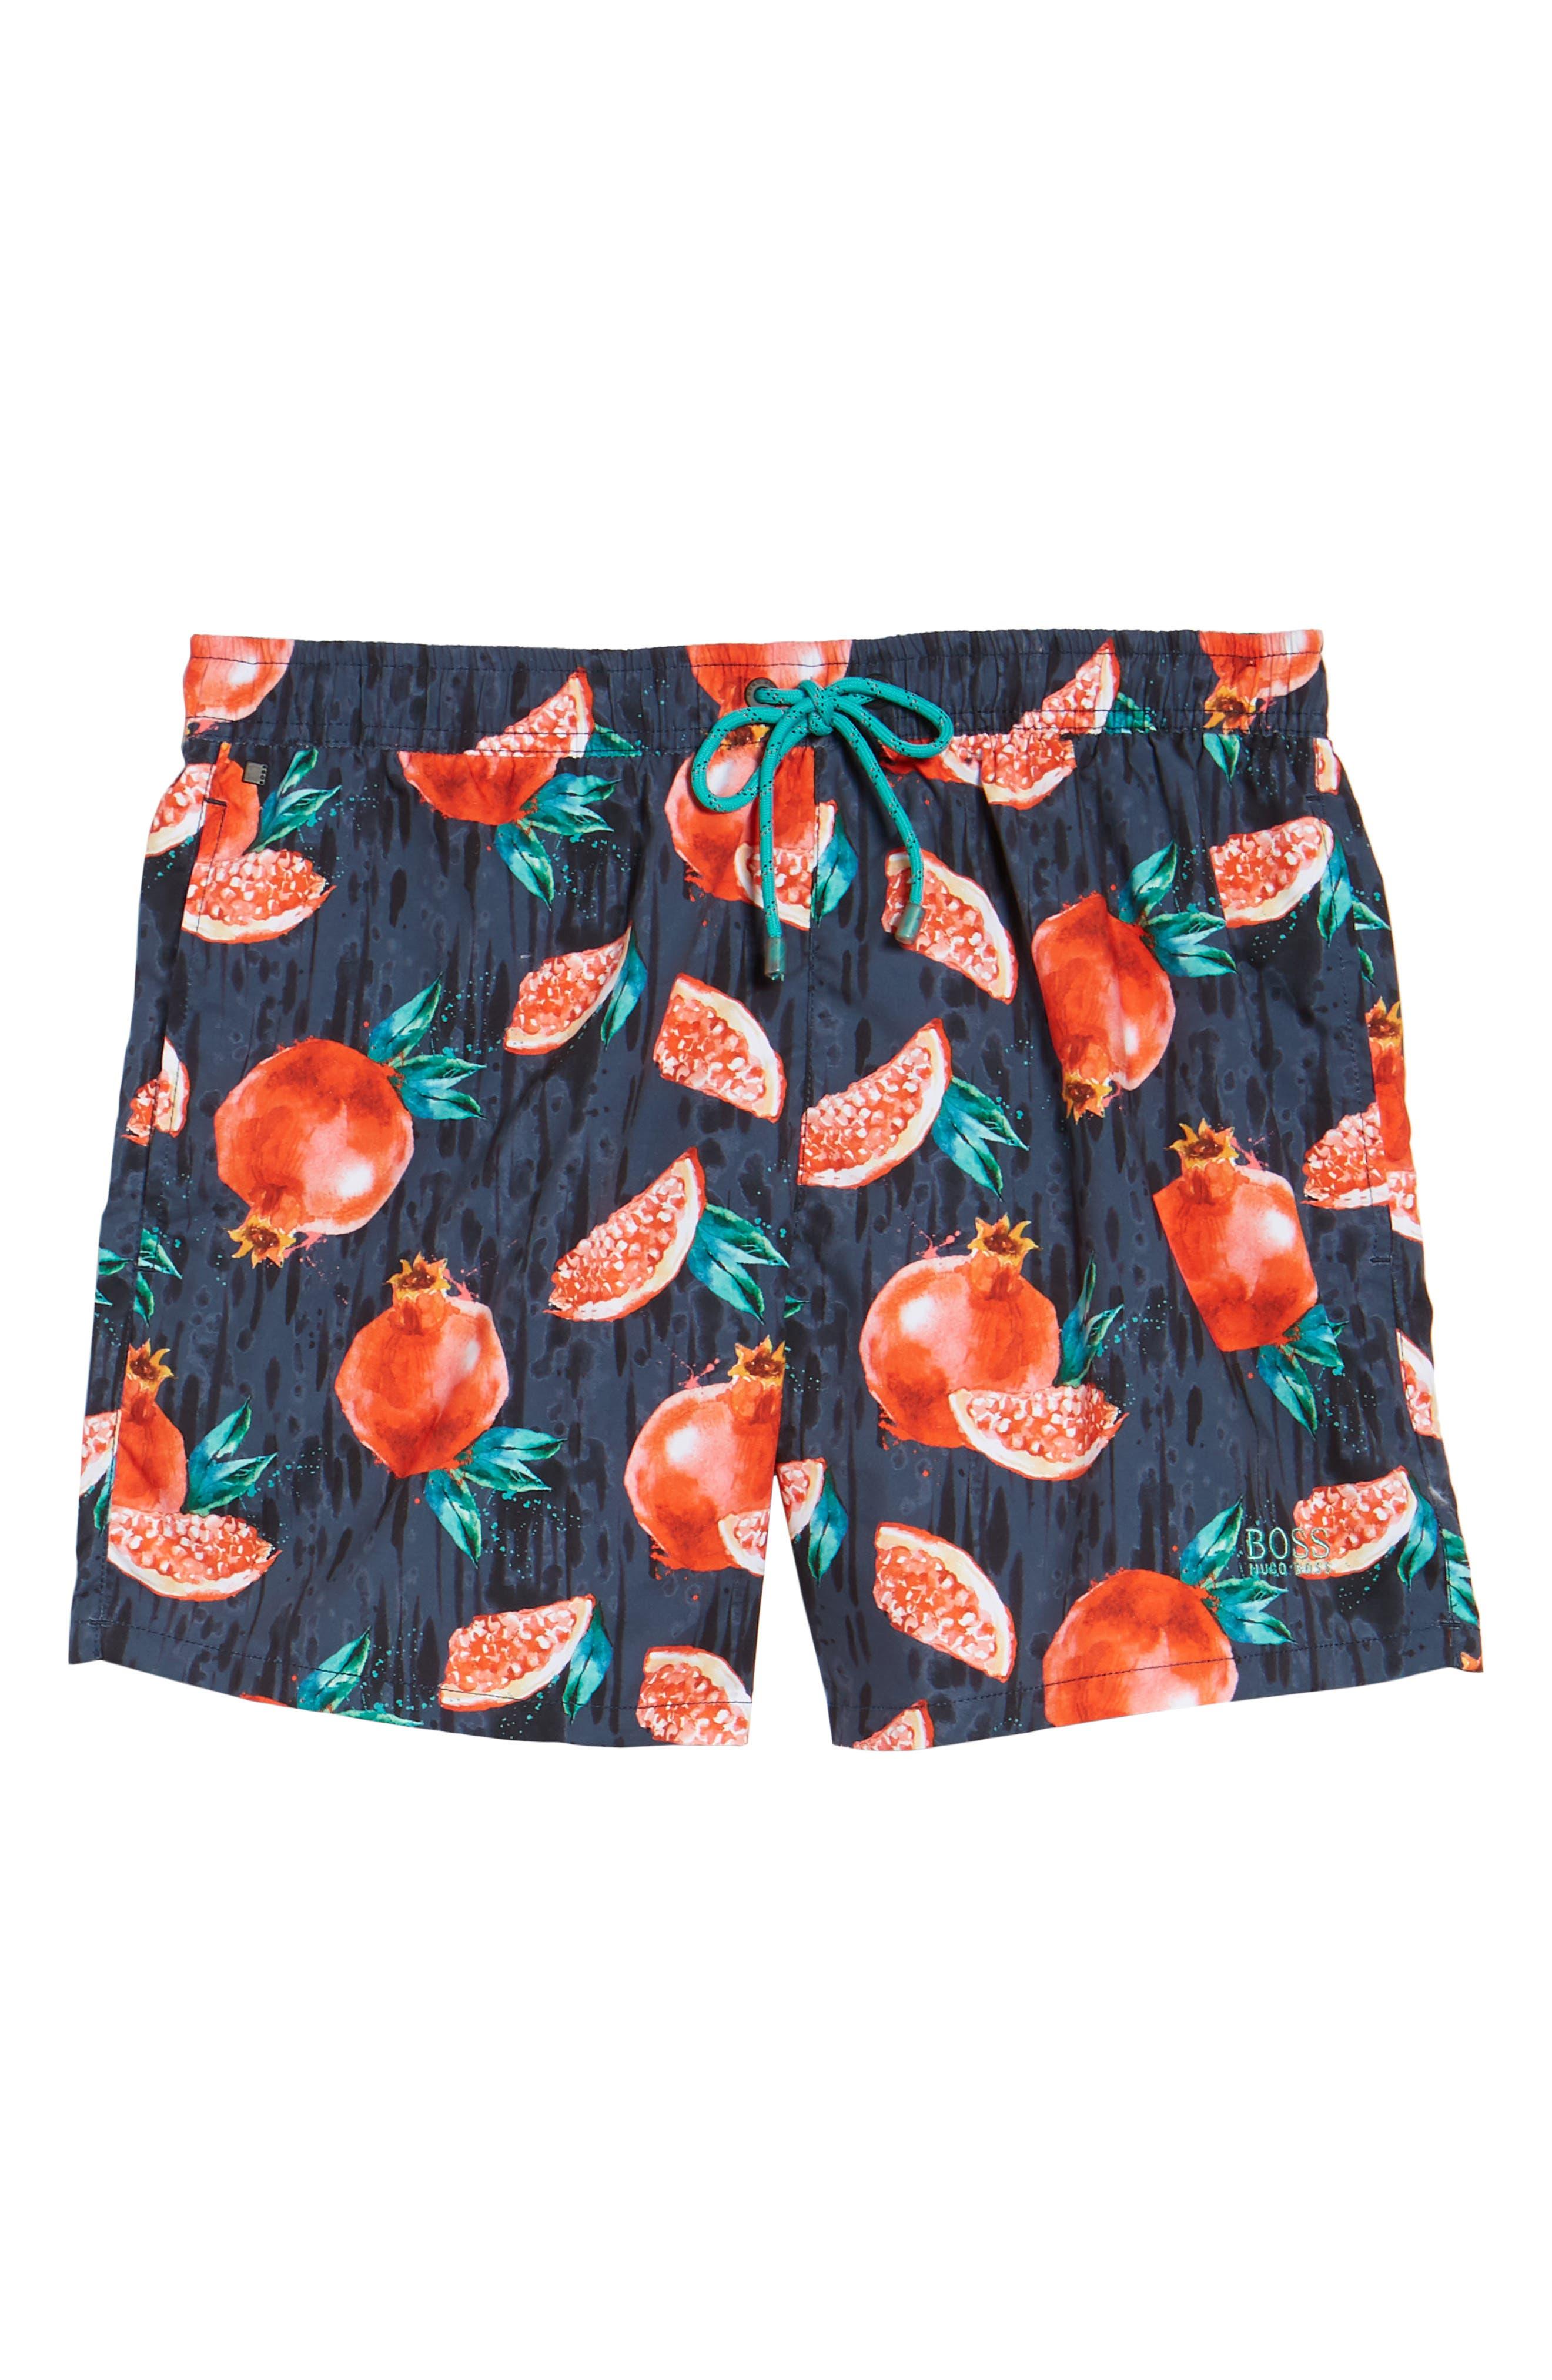 Threadfin Pomegranate Swim Trunks,                             Alternate thumbnail 6, color,                             Grey